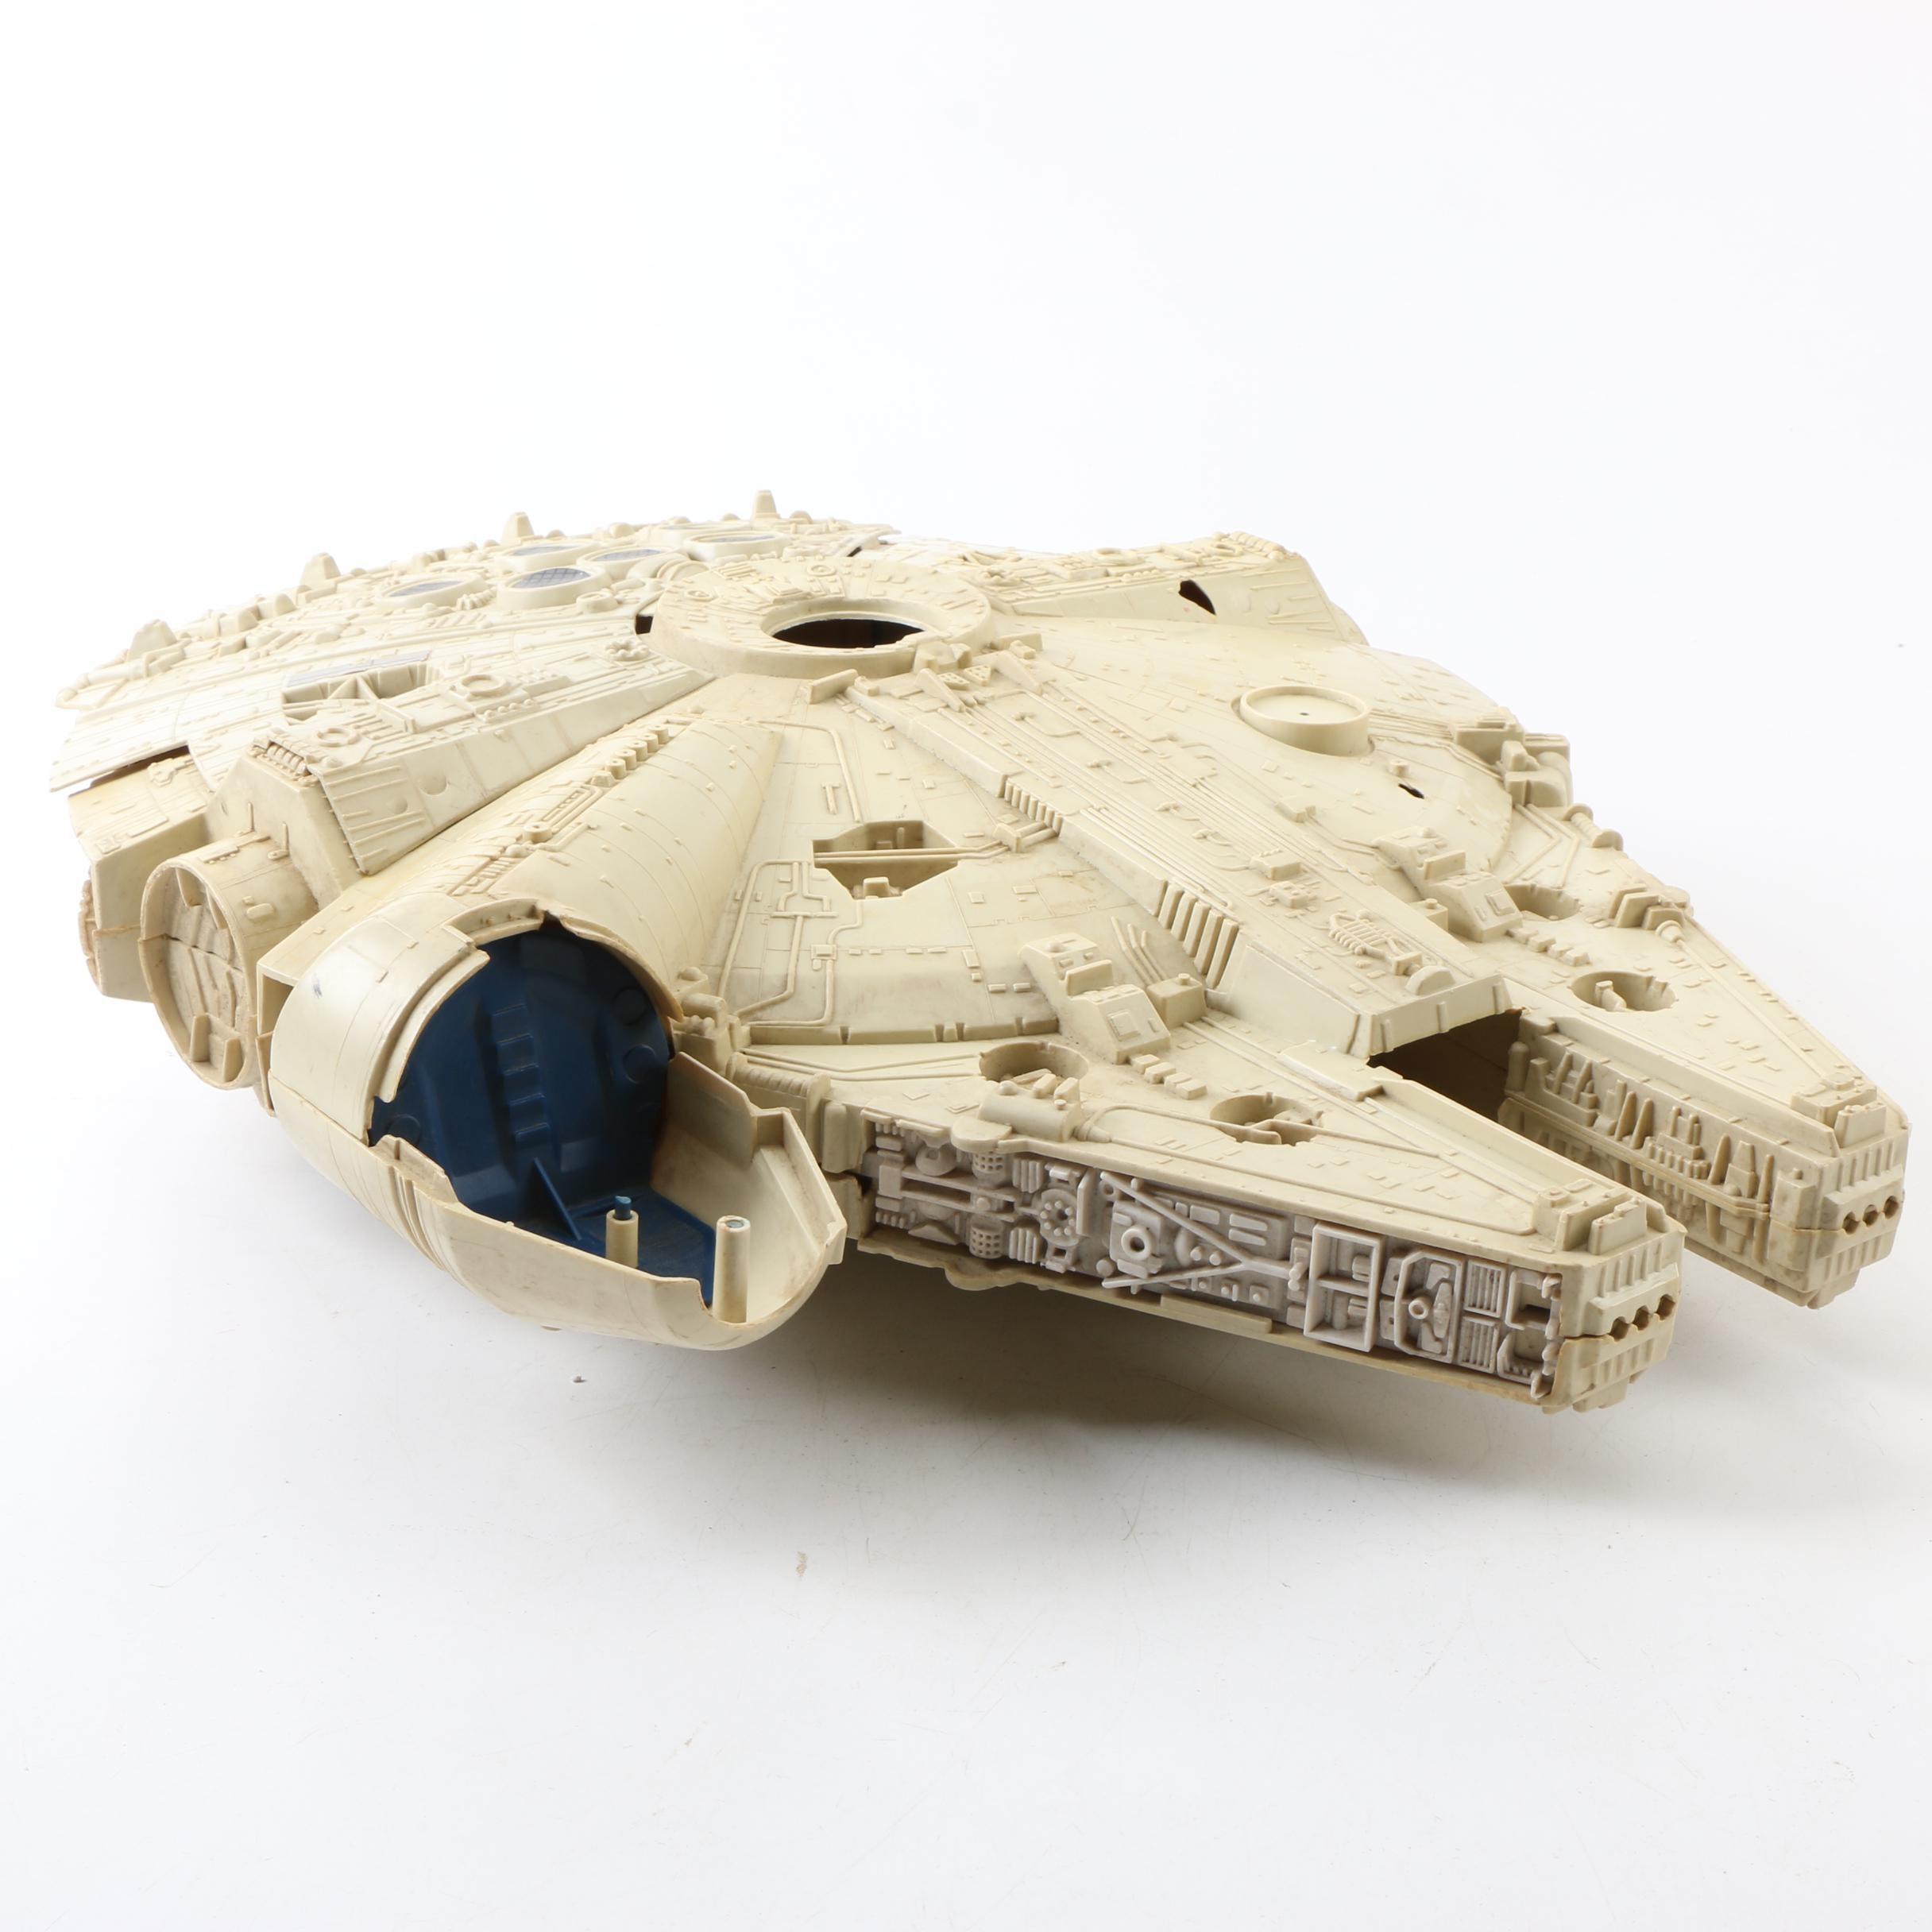 "Vintage 1979 Star Wars ""Millennium Falcon"" by Kenner"